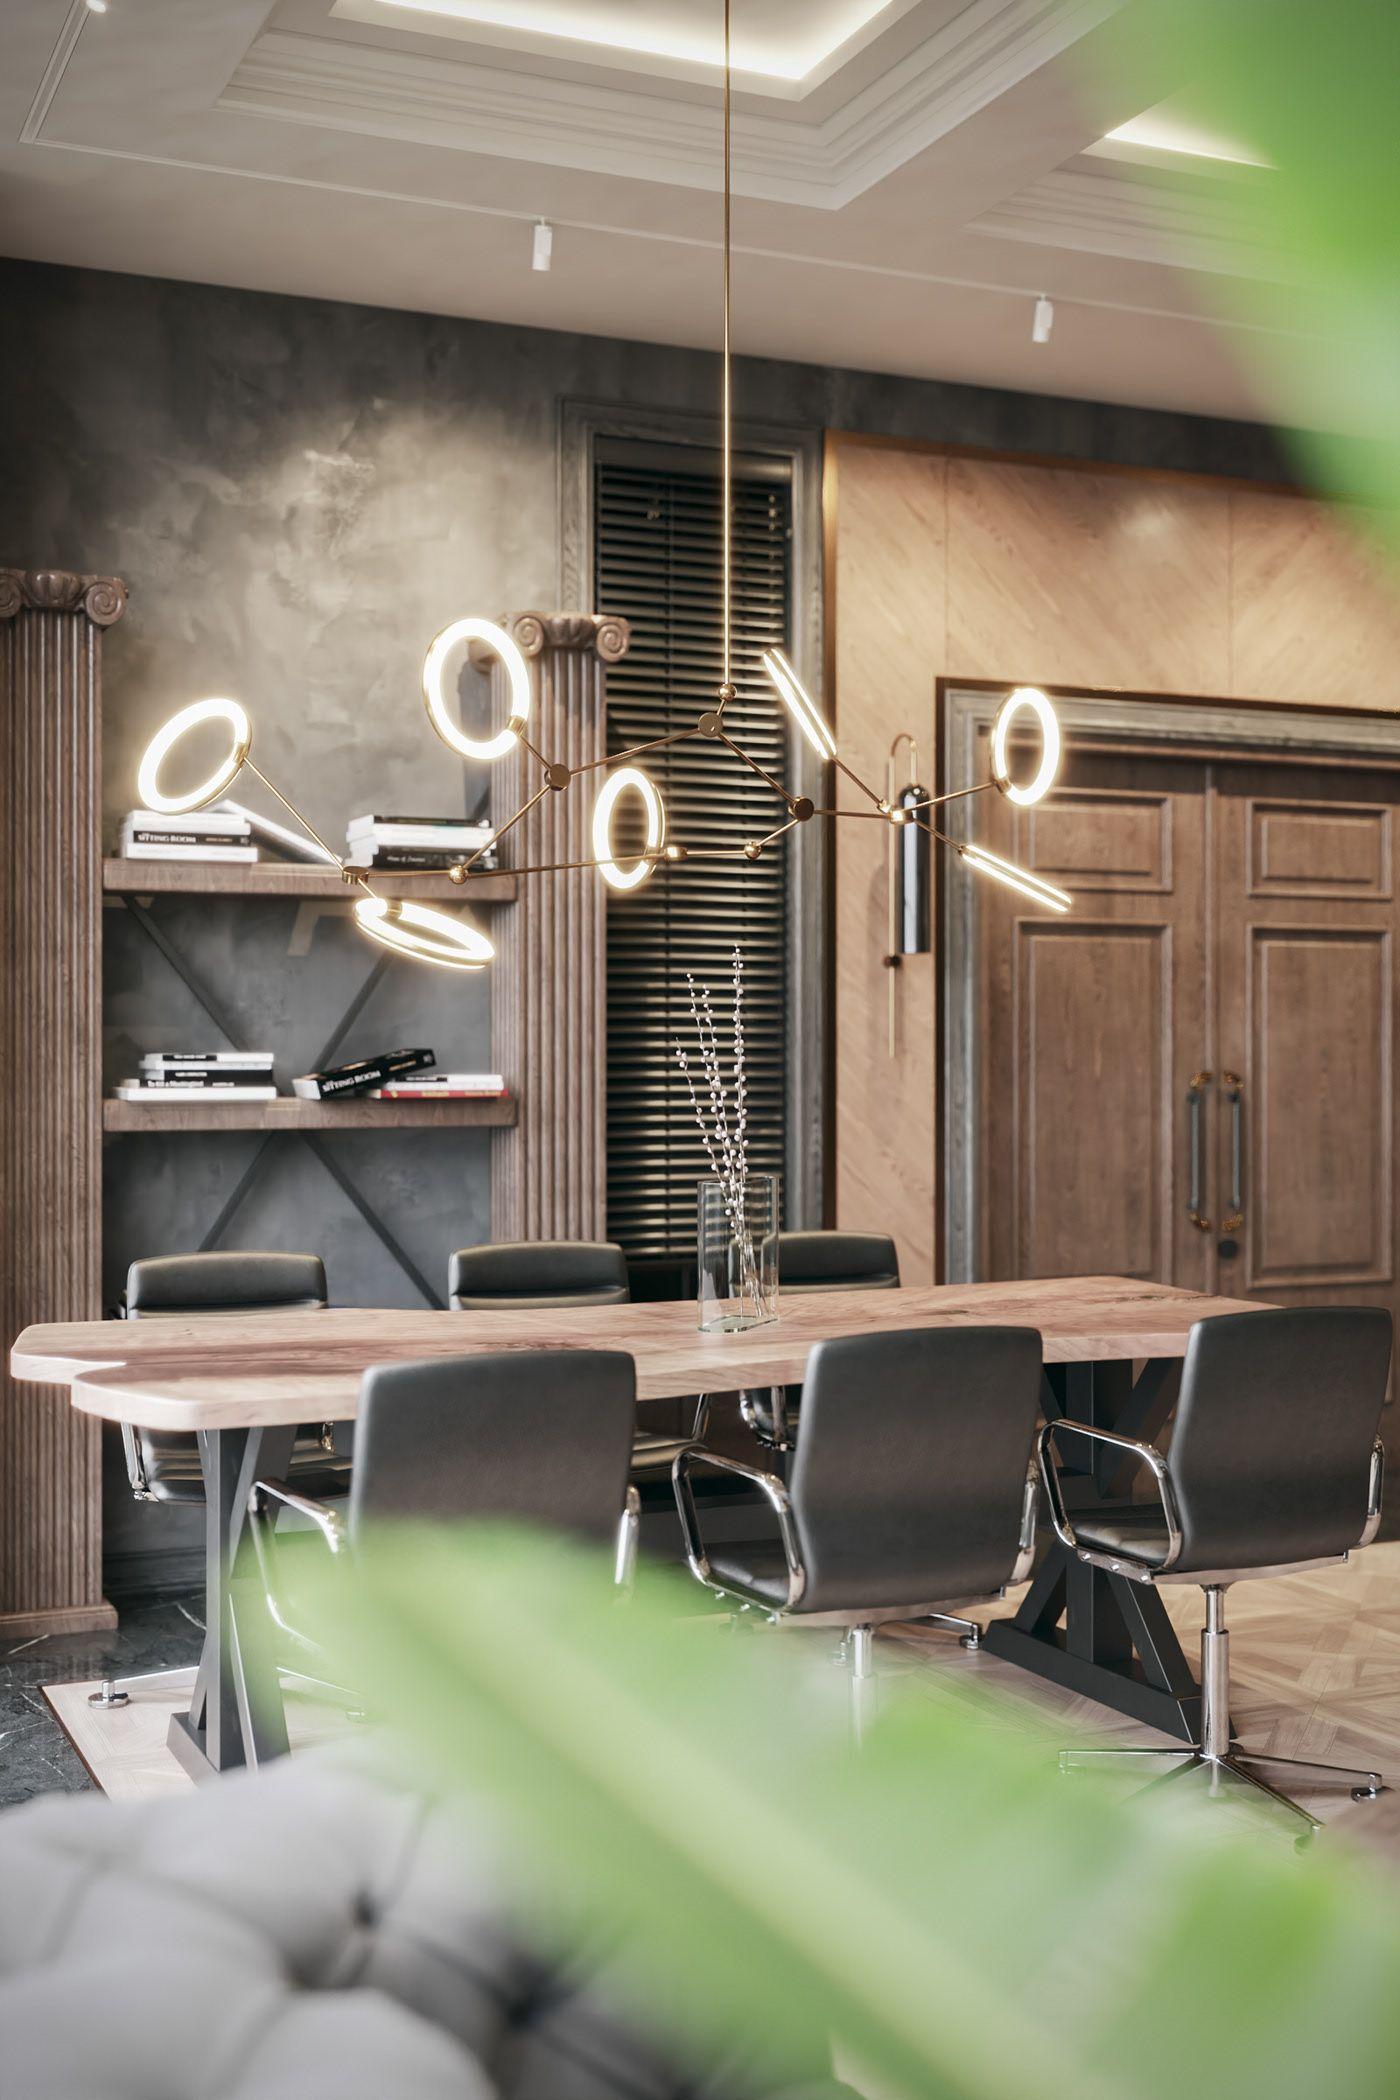 Autodesk Room Design: Autohaus RD Office Space / Ankara TR (VraynextGPU) On